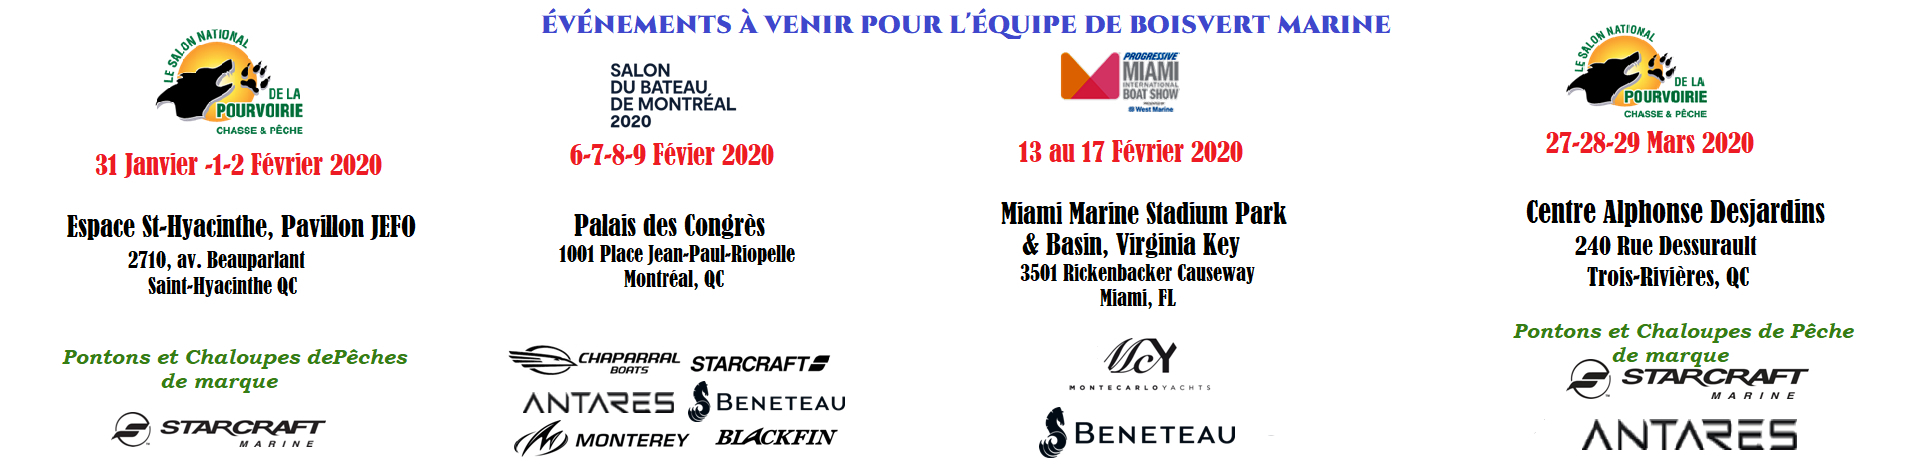 Boisvert Marine à Sorel-Tracy: Scheduled Events for Boisvert Marine